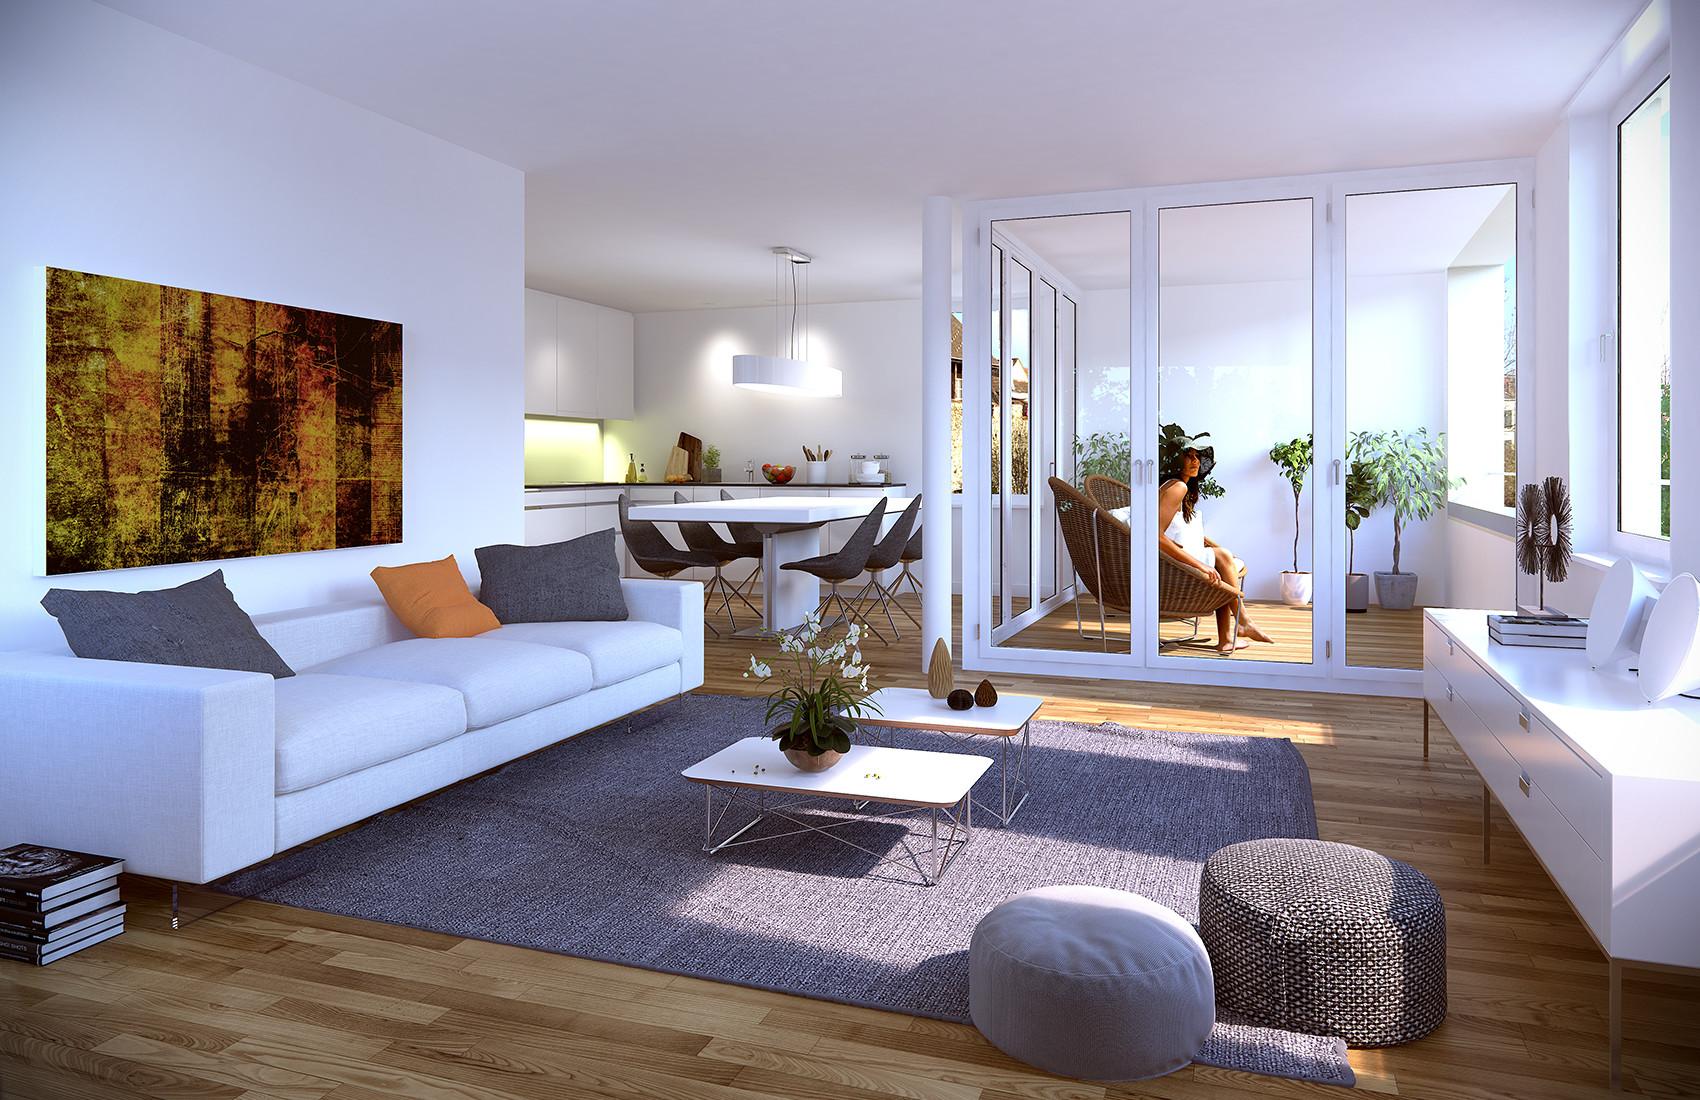 zu verkaufen r timann hoch tiefbau ag baugesch ft. Black Bedroom Furniture Sets. Home Design Ideas